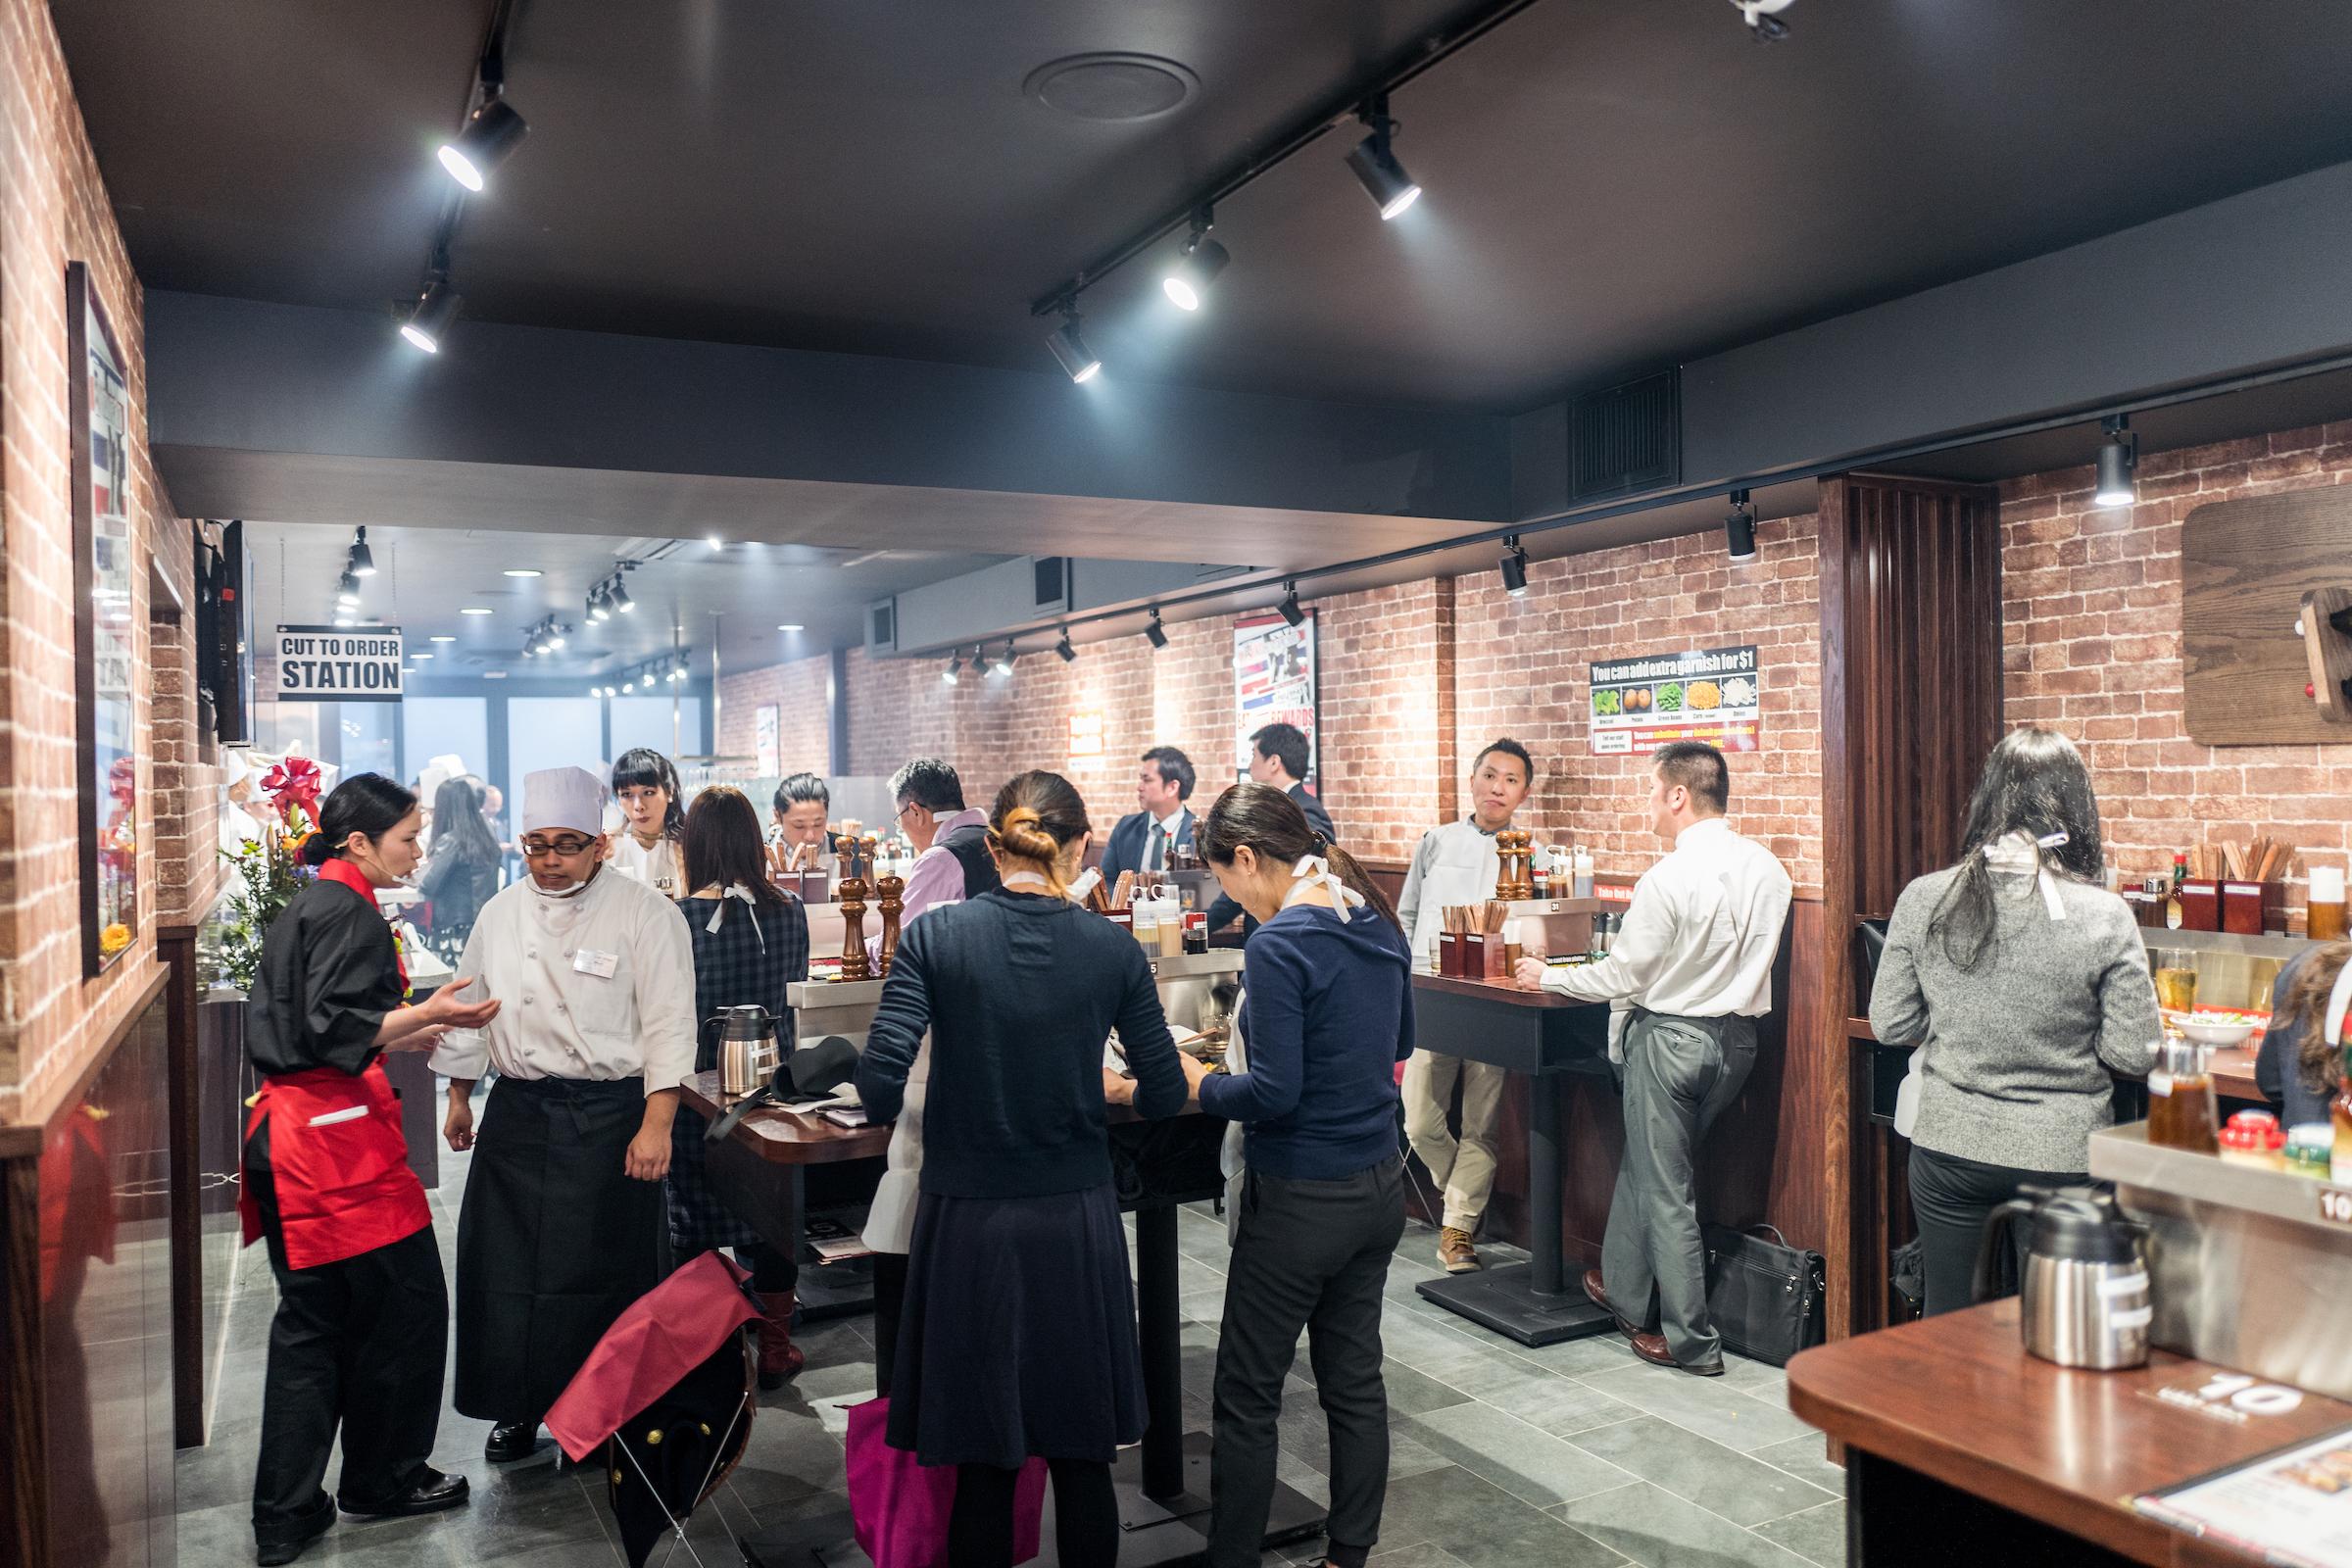 Japanese Standing Steakhouse Ikinari Will Shutter 9 of Its 11 NYC Locations